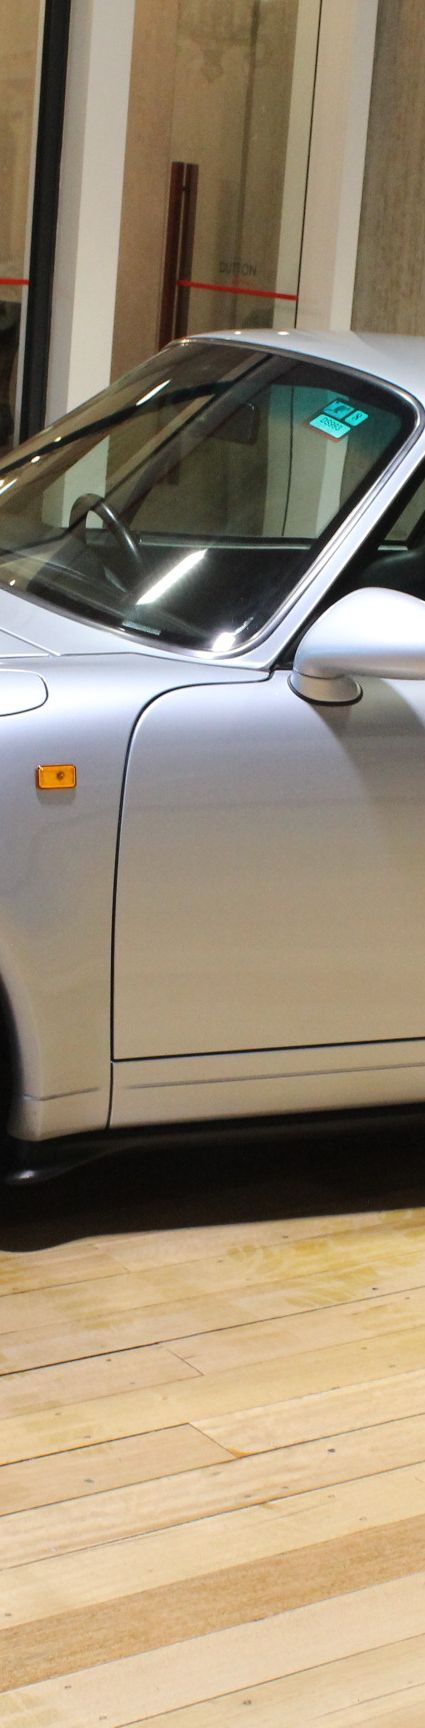 1995 Porsche 993 RS Touring - for sale in Ausralia